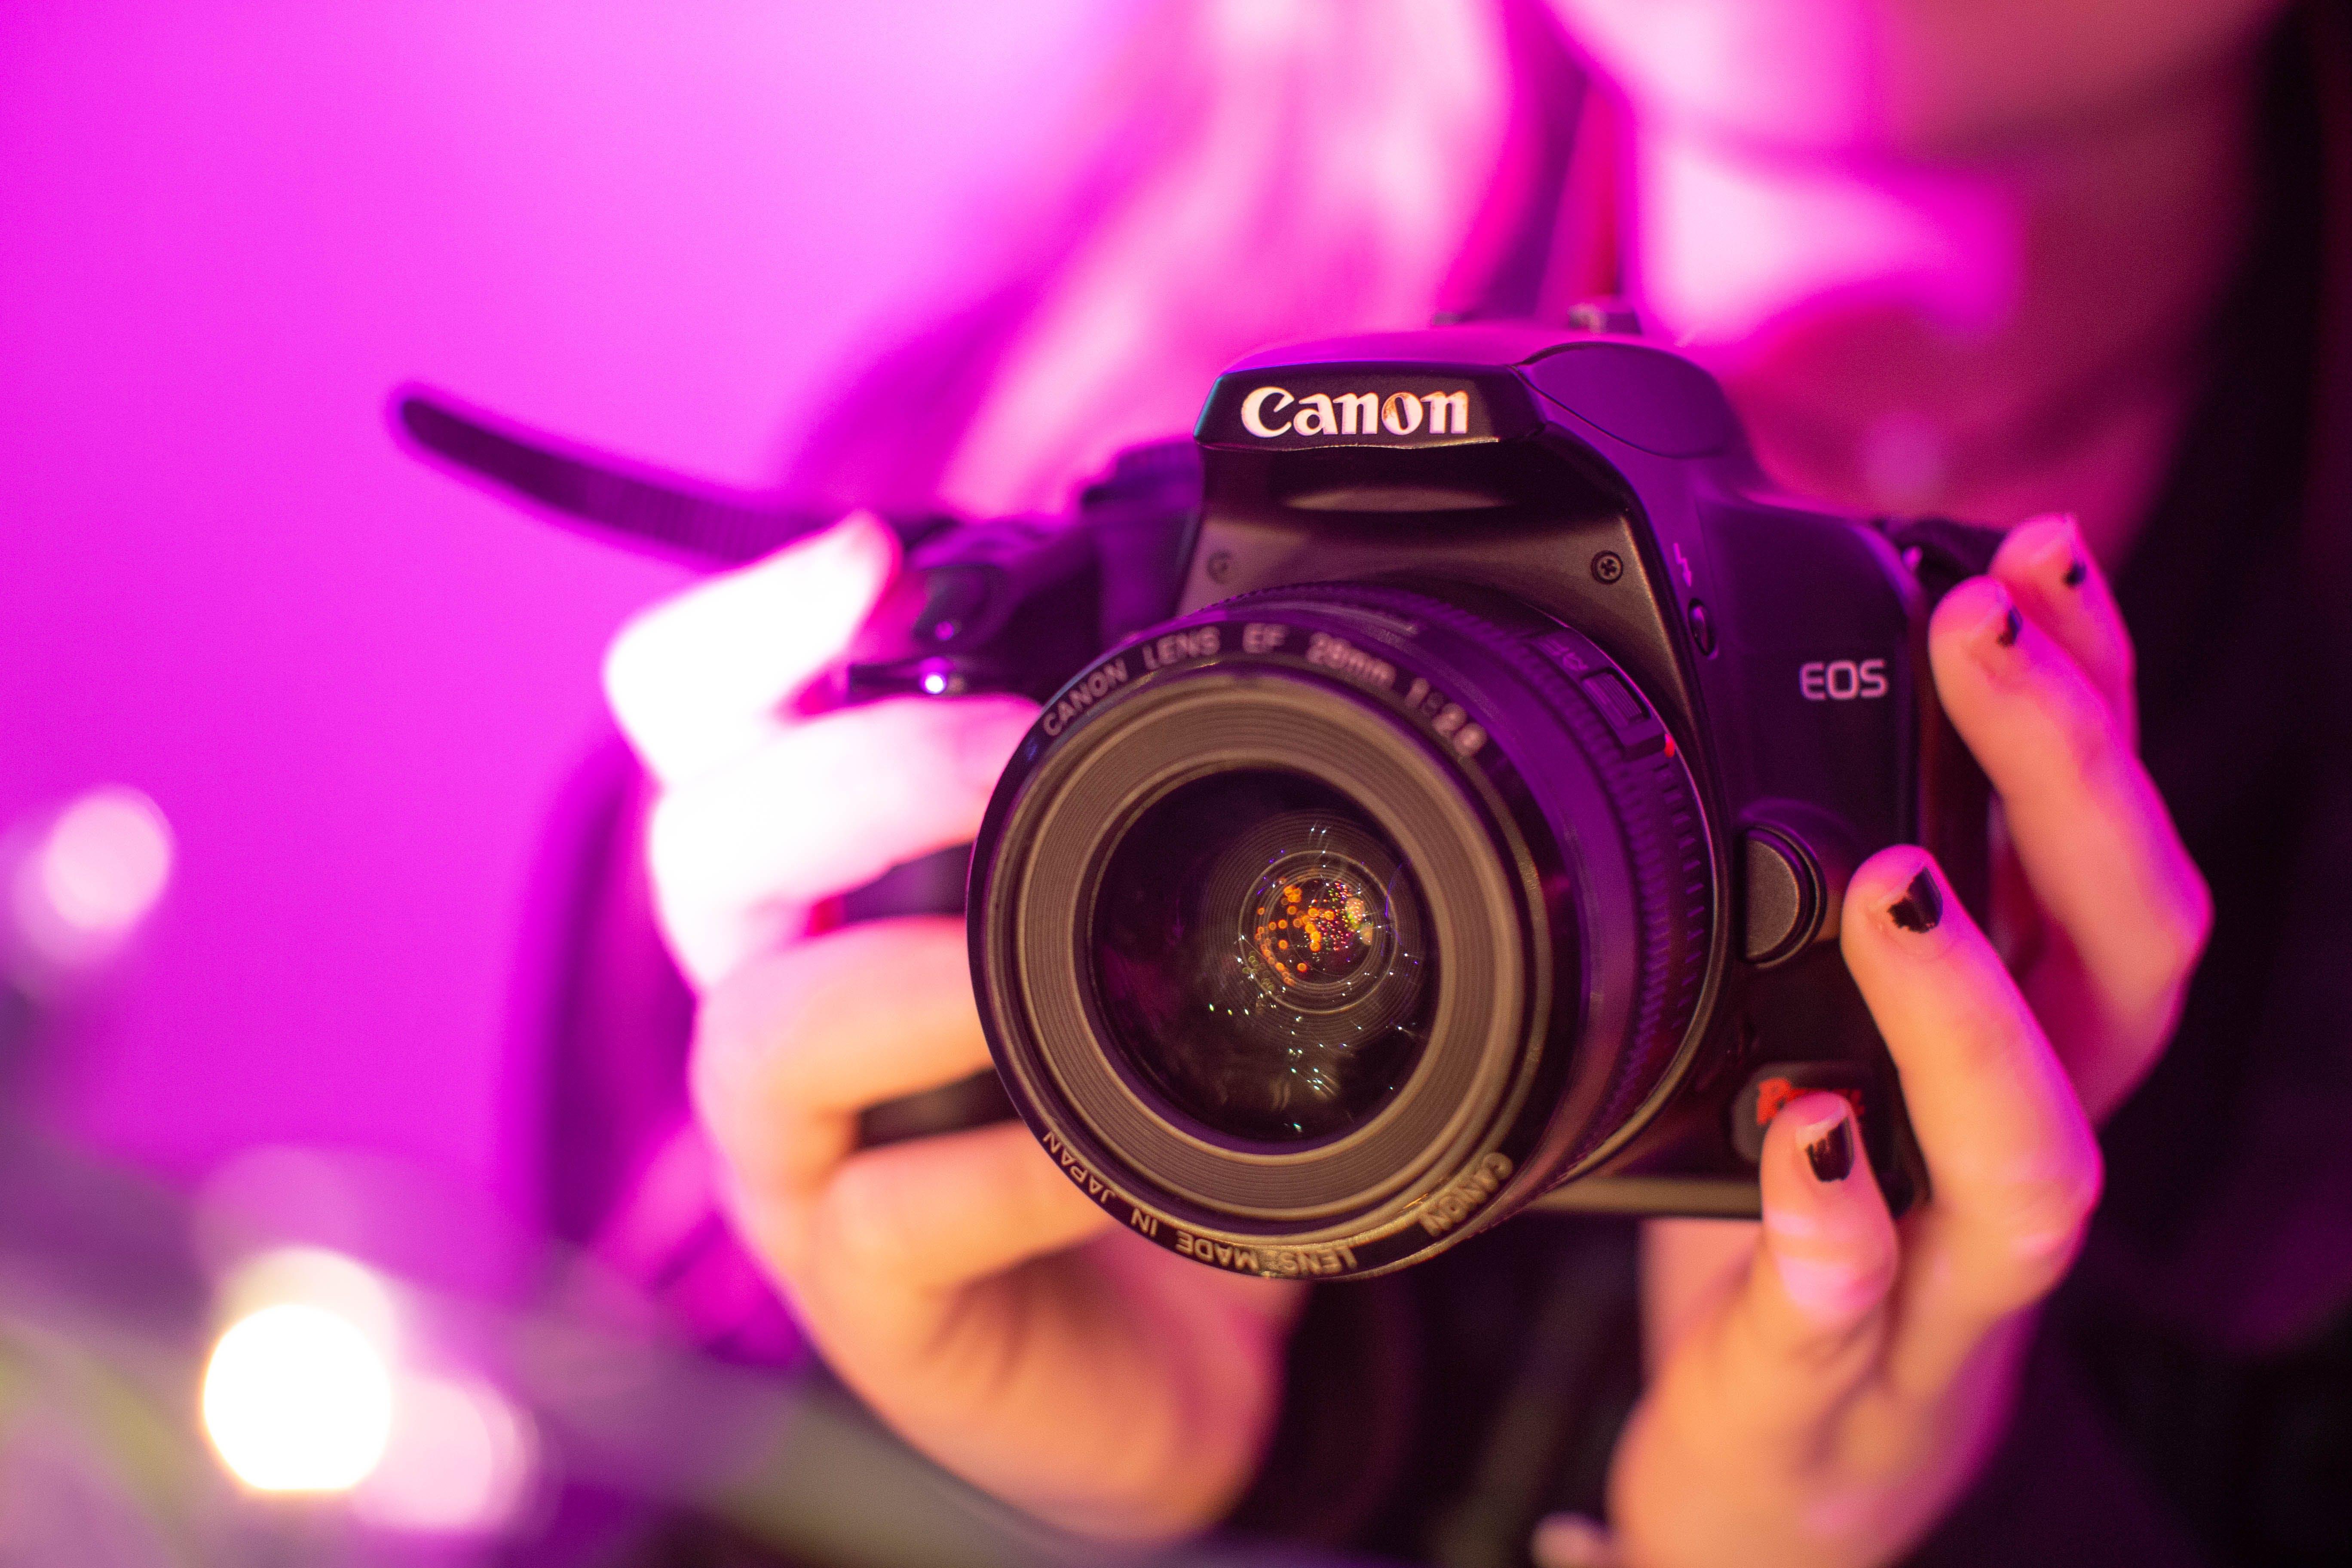 Immagine gratuita di fotocamera, fotografia, lente